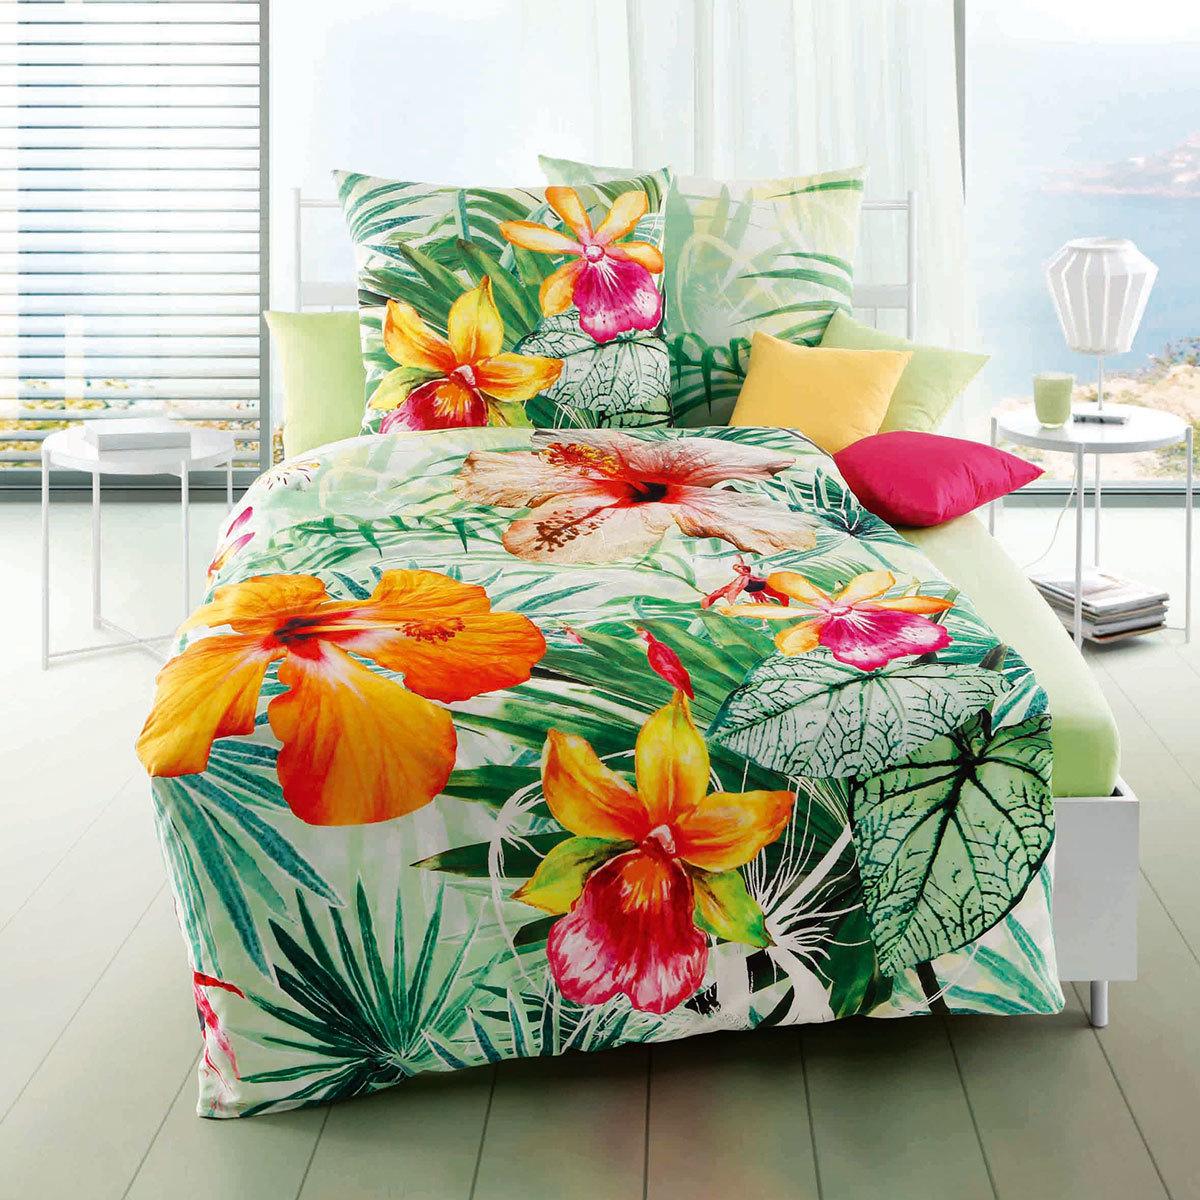 Kaeppel Mako Satin Bettwäsche Honolulu Grün Günstig Online Kaufen